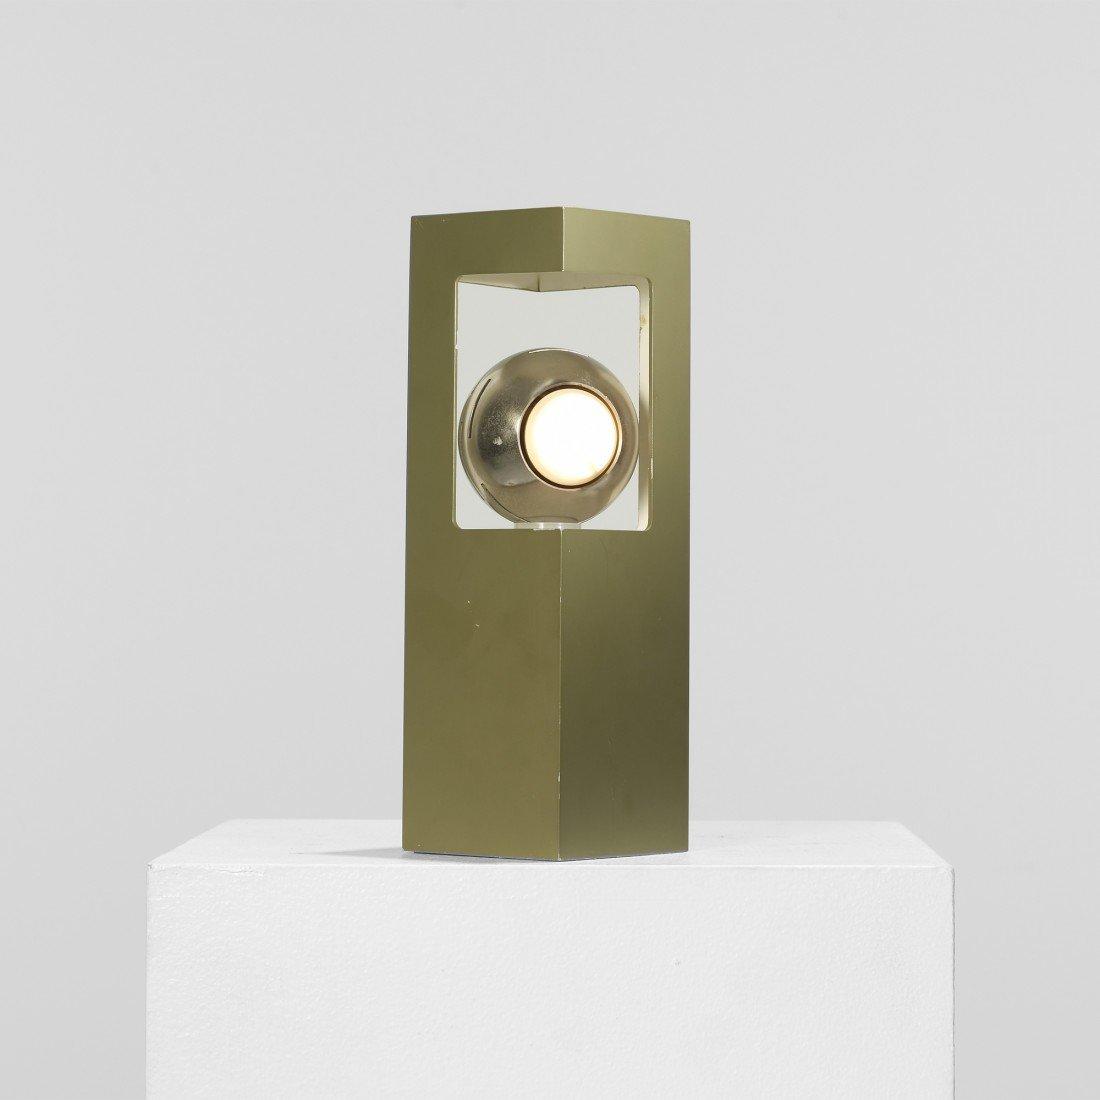 191: Angelo Lelli table lamp, model 14005